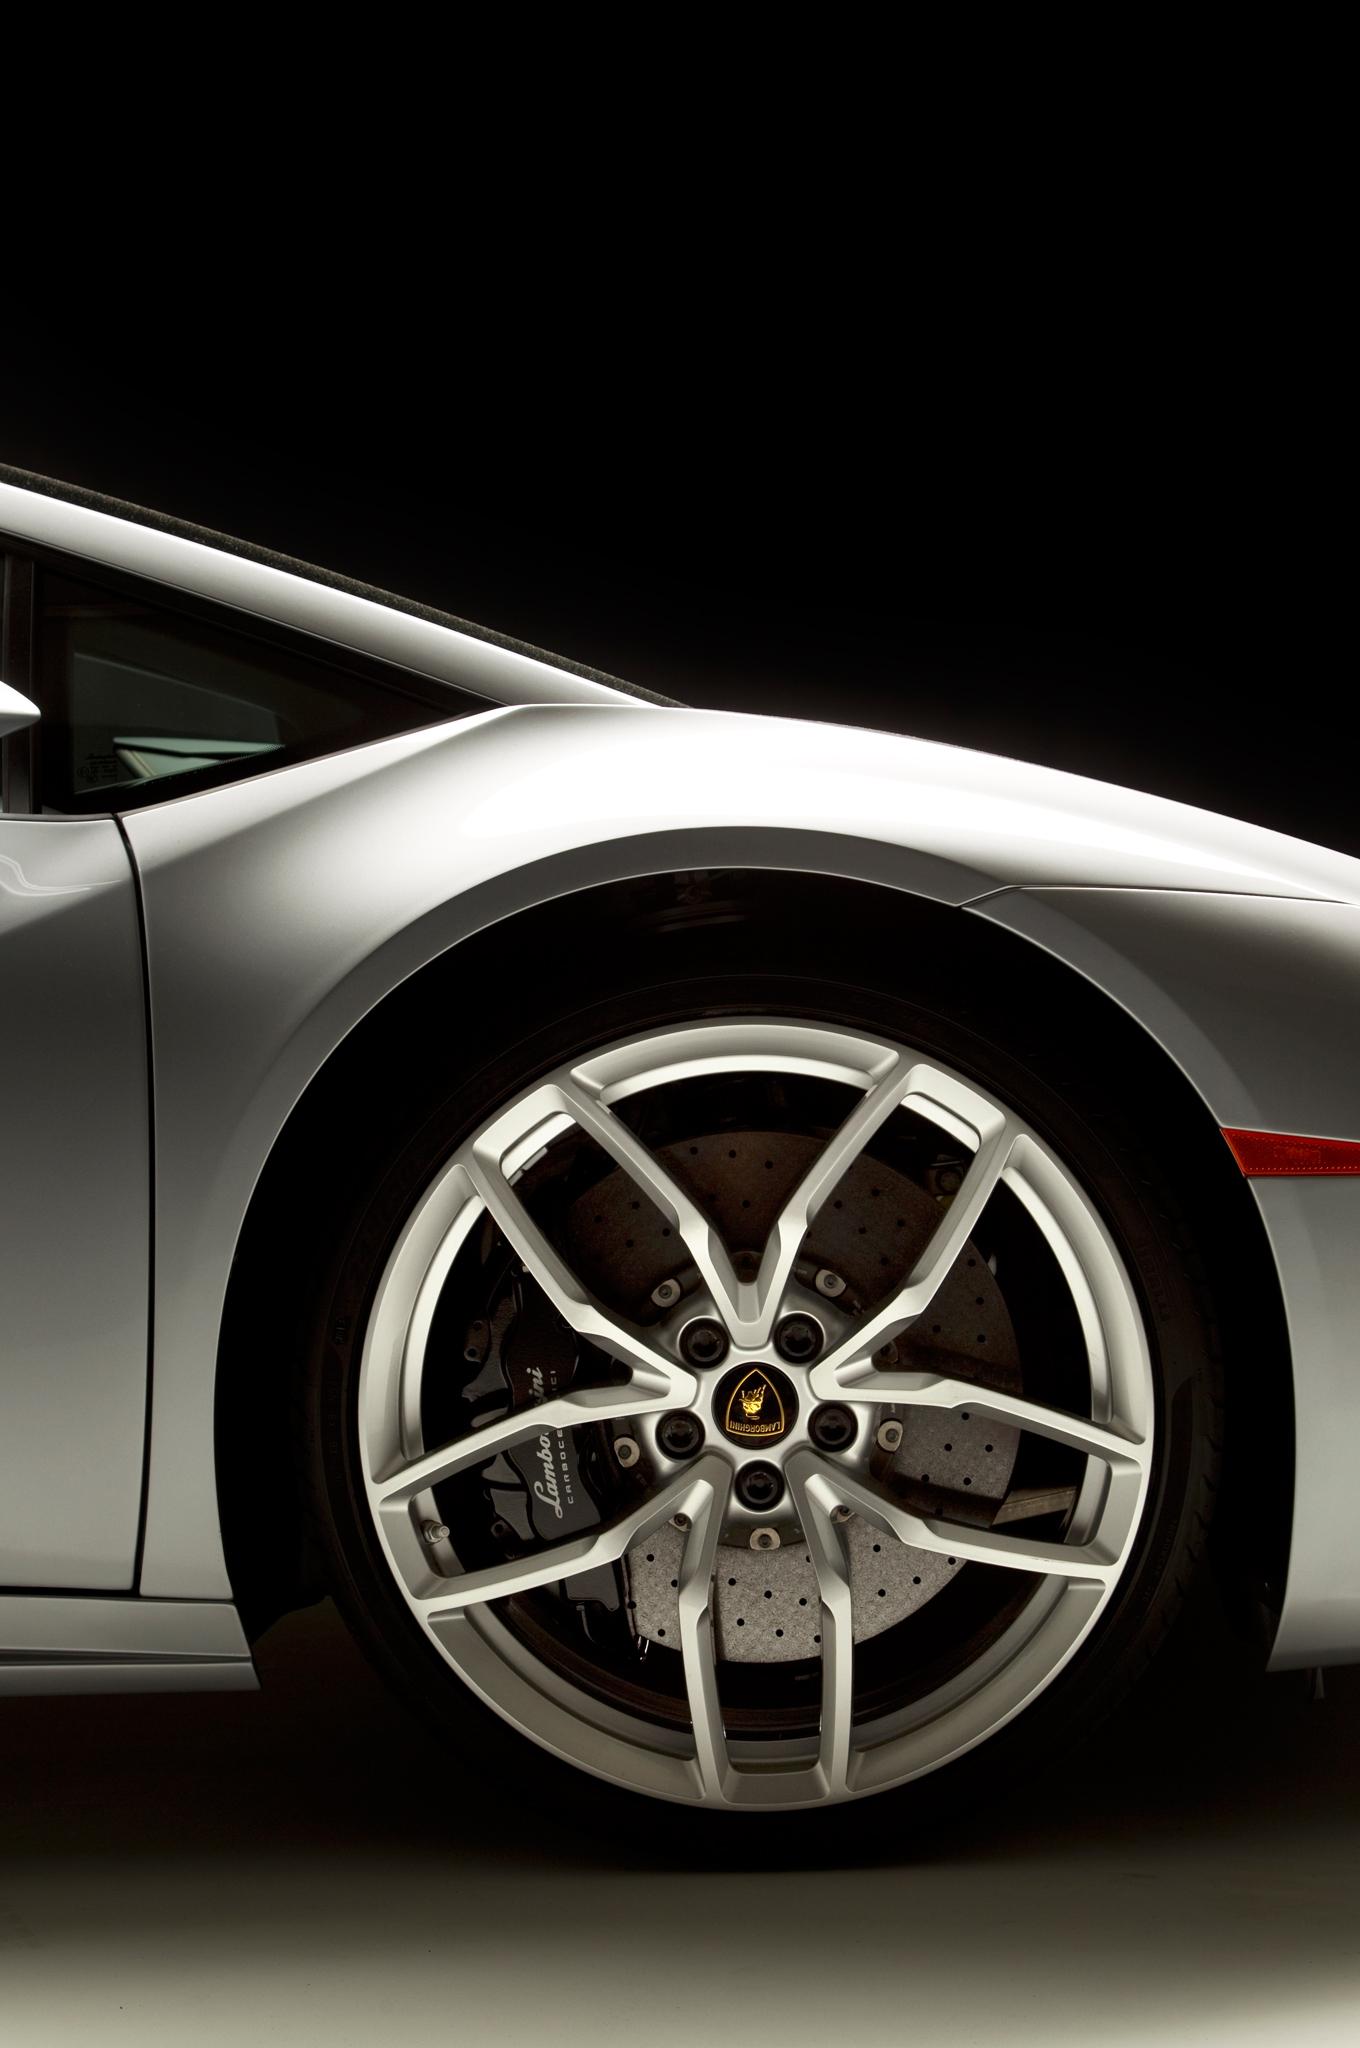 http—image.motortrend.com-f-roadtests-exotic-1312_2015_lamborghini_huracan_first_look-59412221-2015-Lamborghini-Huracan-wheels